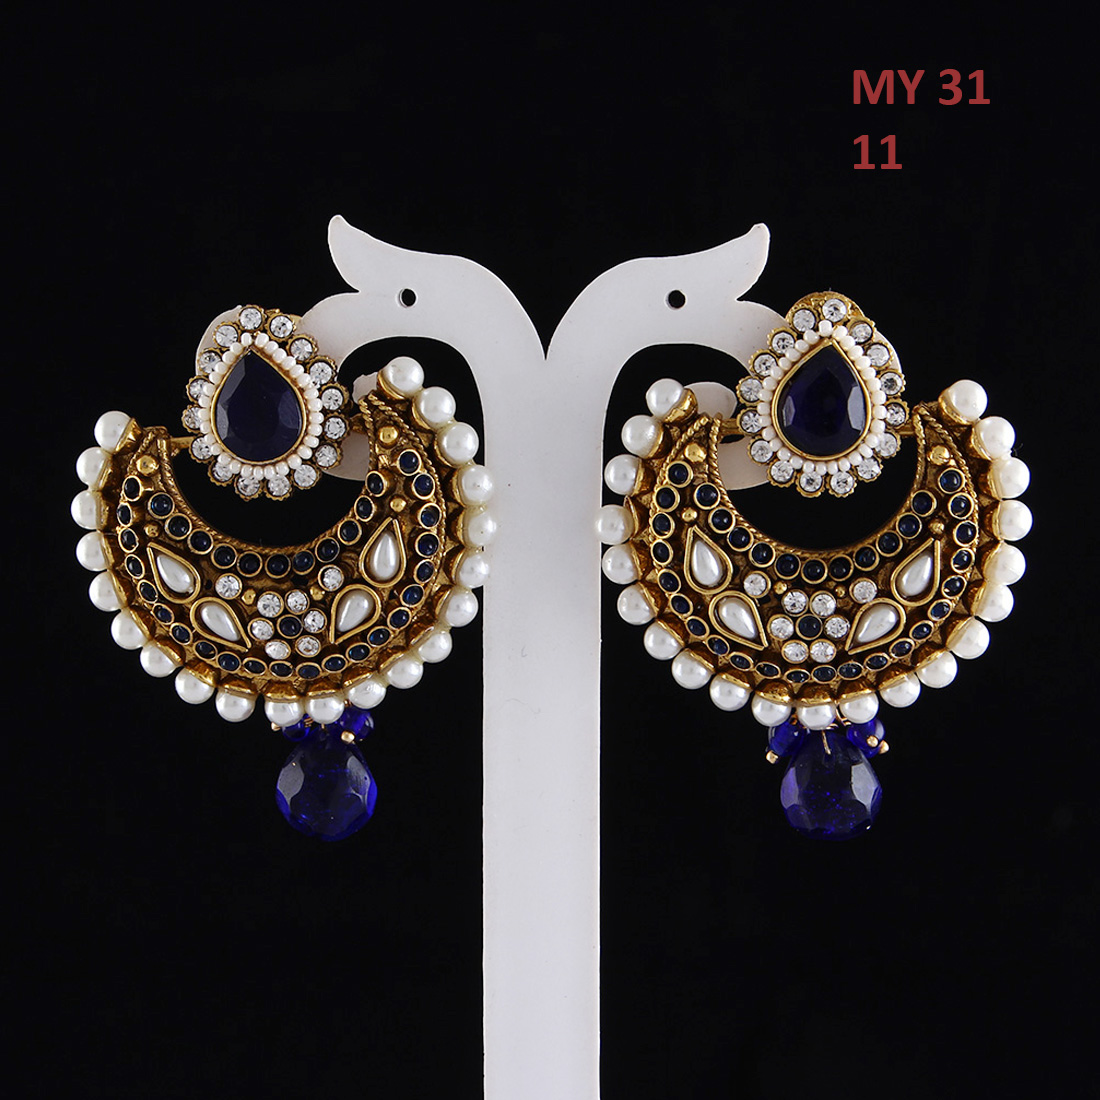 55Carat | Jhumki Earrings Gold Plated White CZ, Pearl White CZ, Pearl Fashion Statement Jhumki Earrings Gold Plated White CZ, Pearl for Girls and Women Fashion Statement